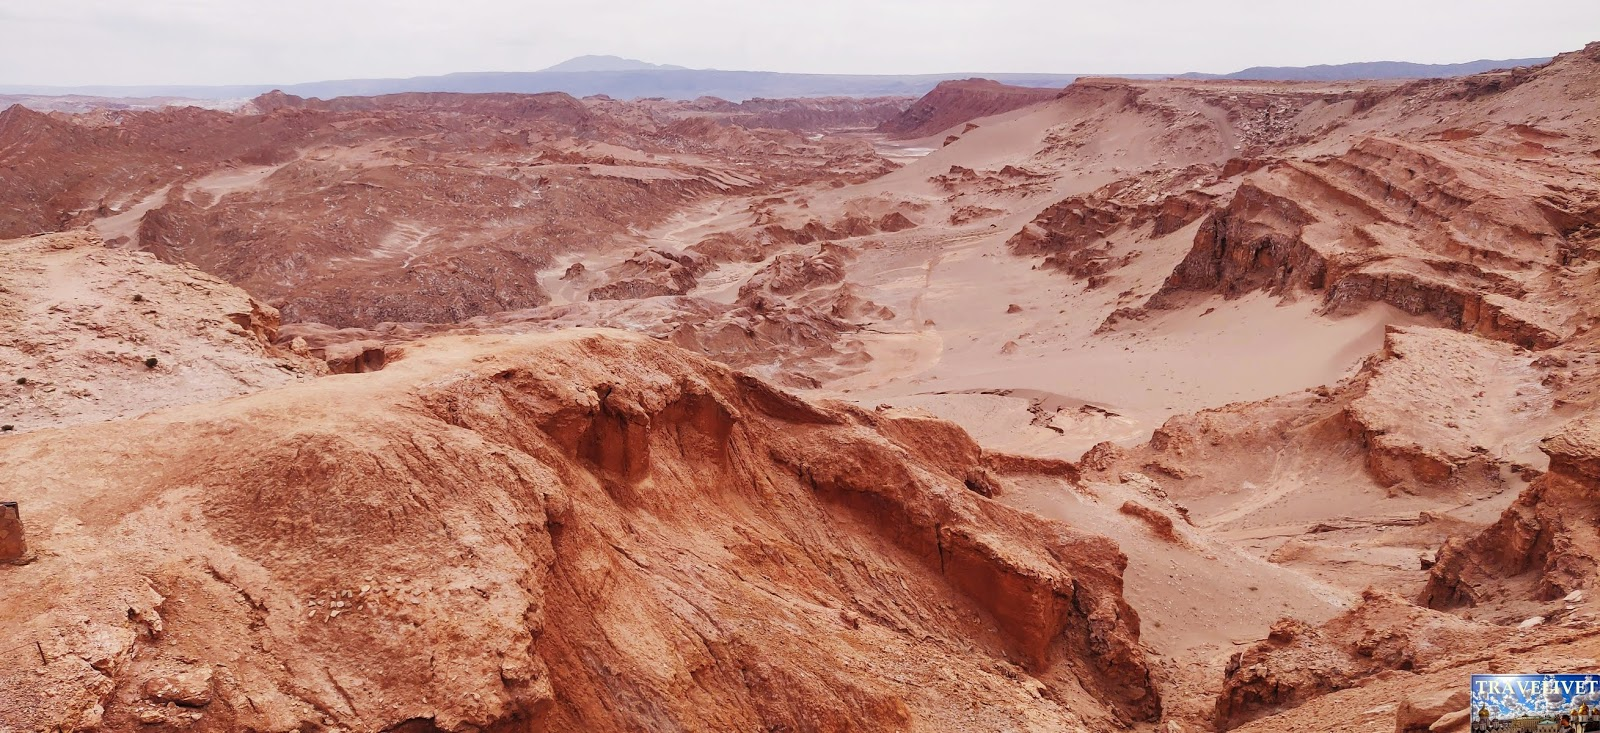 Chili Chile San Pedro de Atacama désert Vallée de la Mort